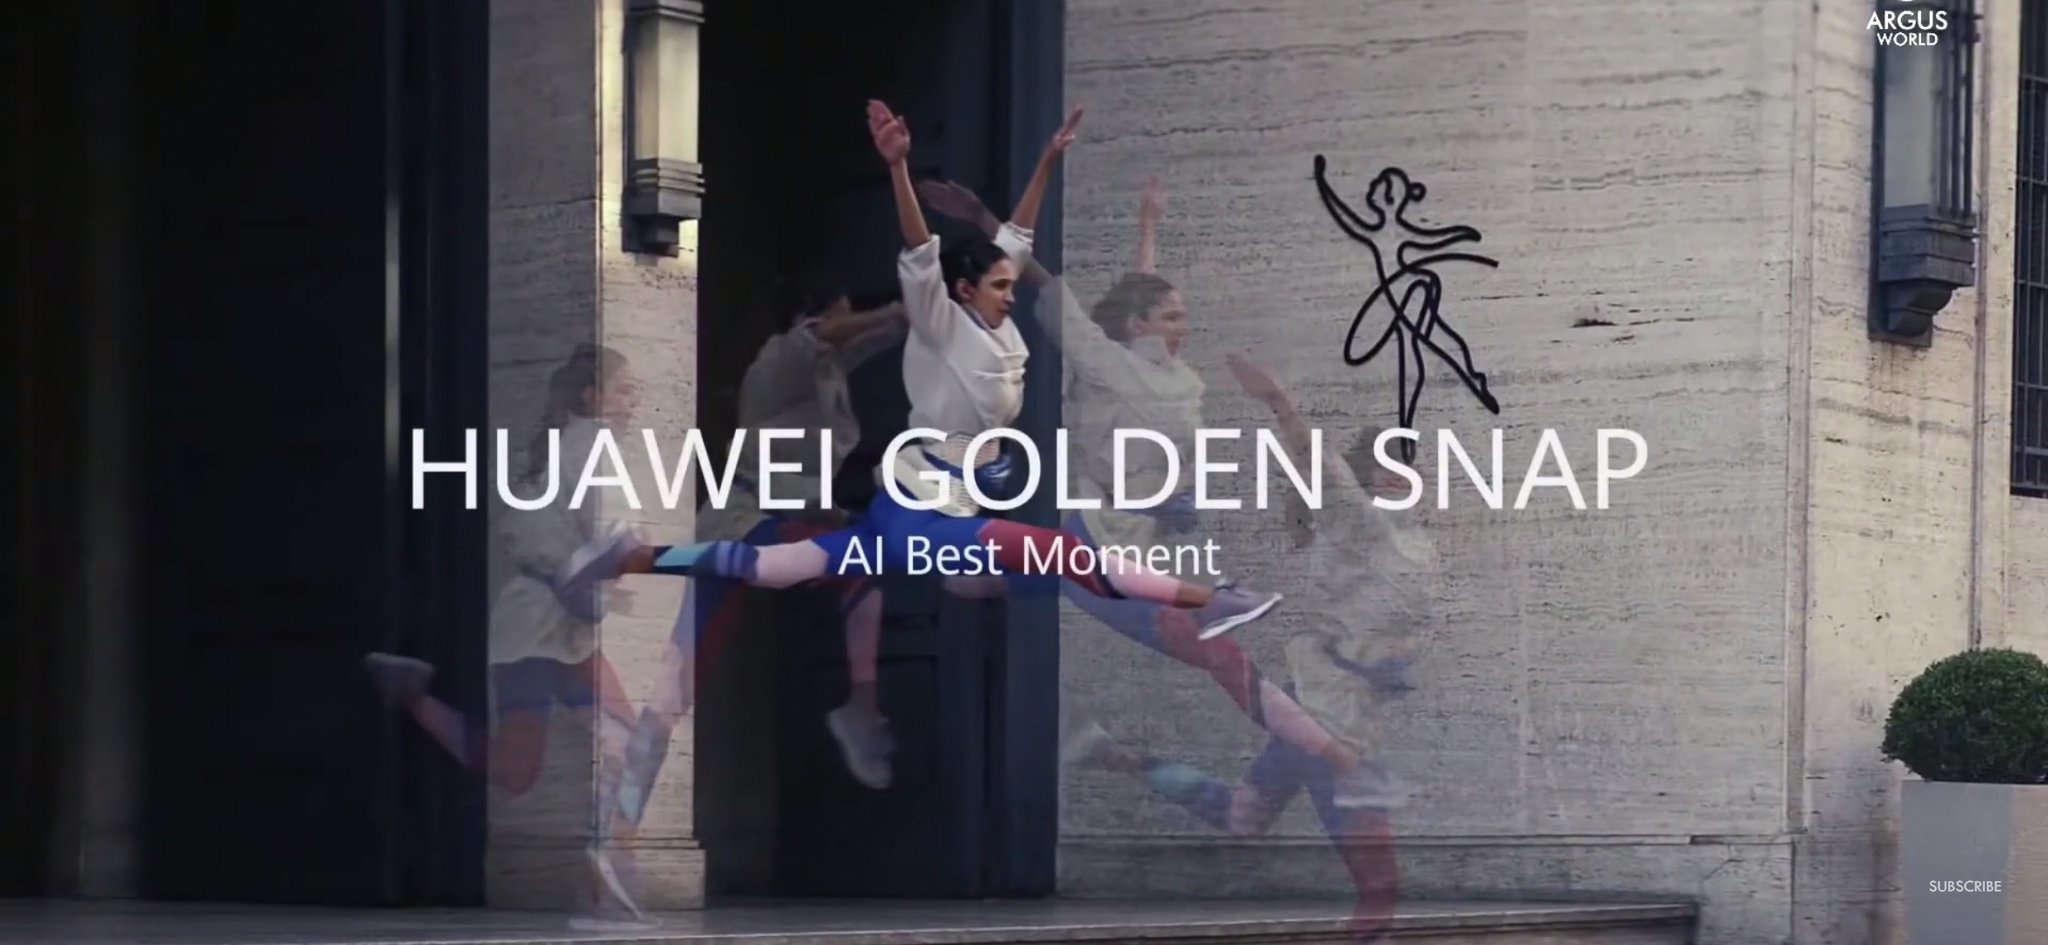 huawei golden snap